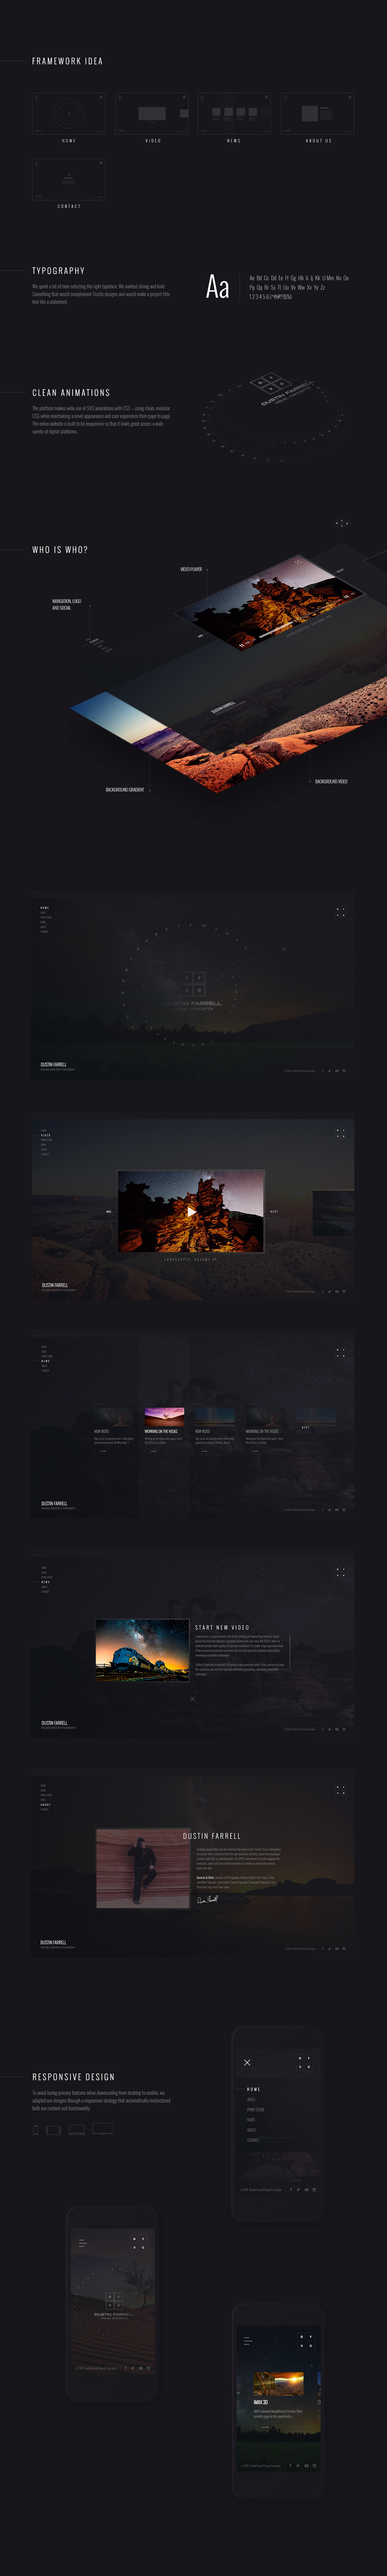 Web Siiz minimal portfolio gallery black promo Website